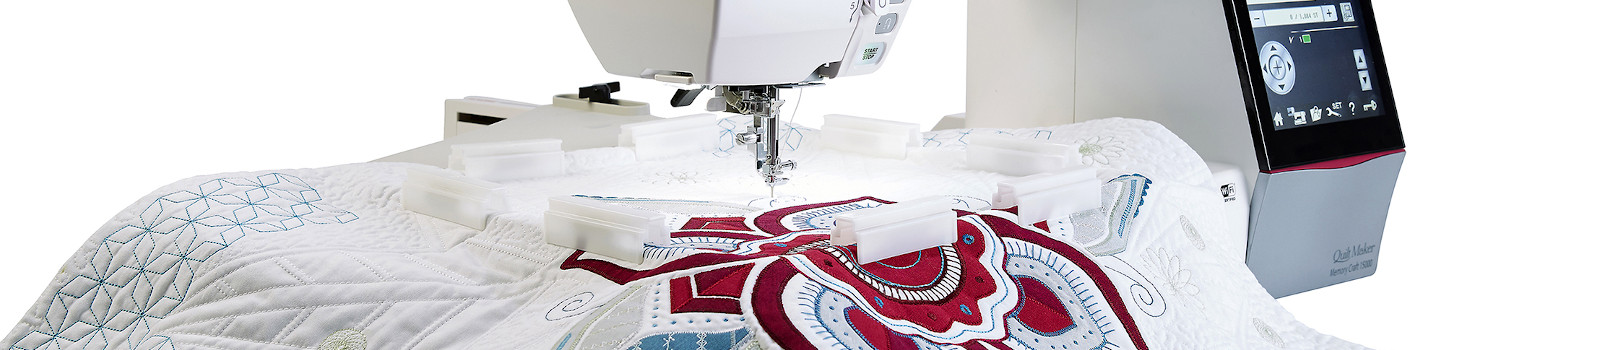 Janome Horizon Quilt Maker Memory Craft 15000 Embroidery Machine